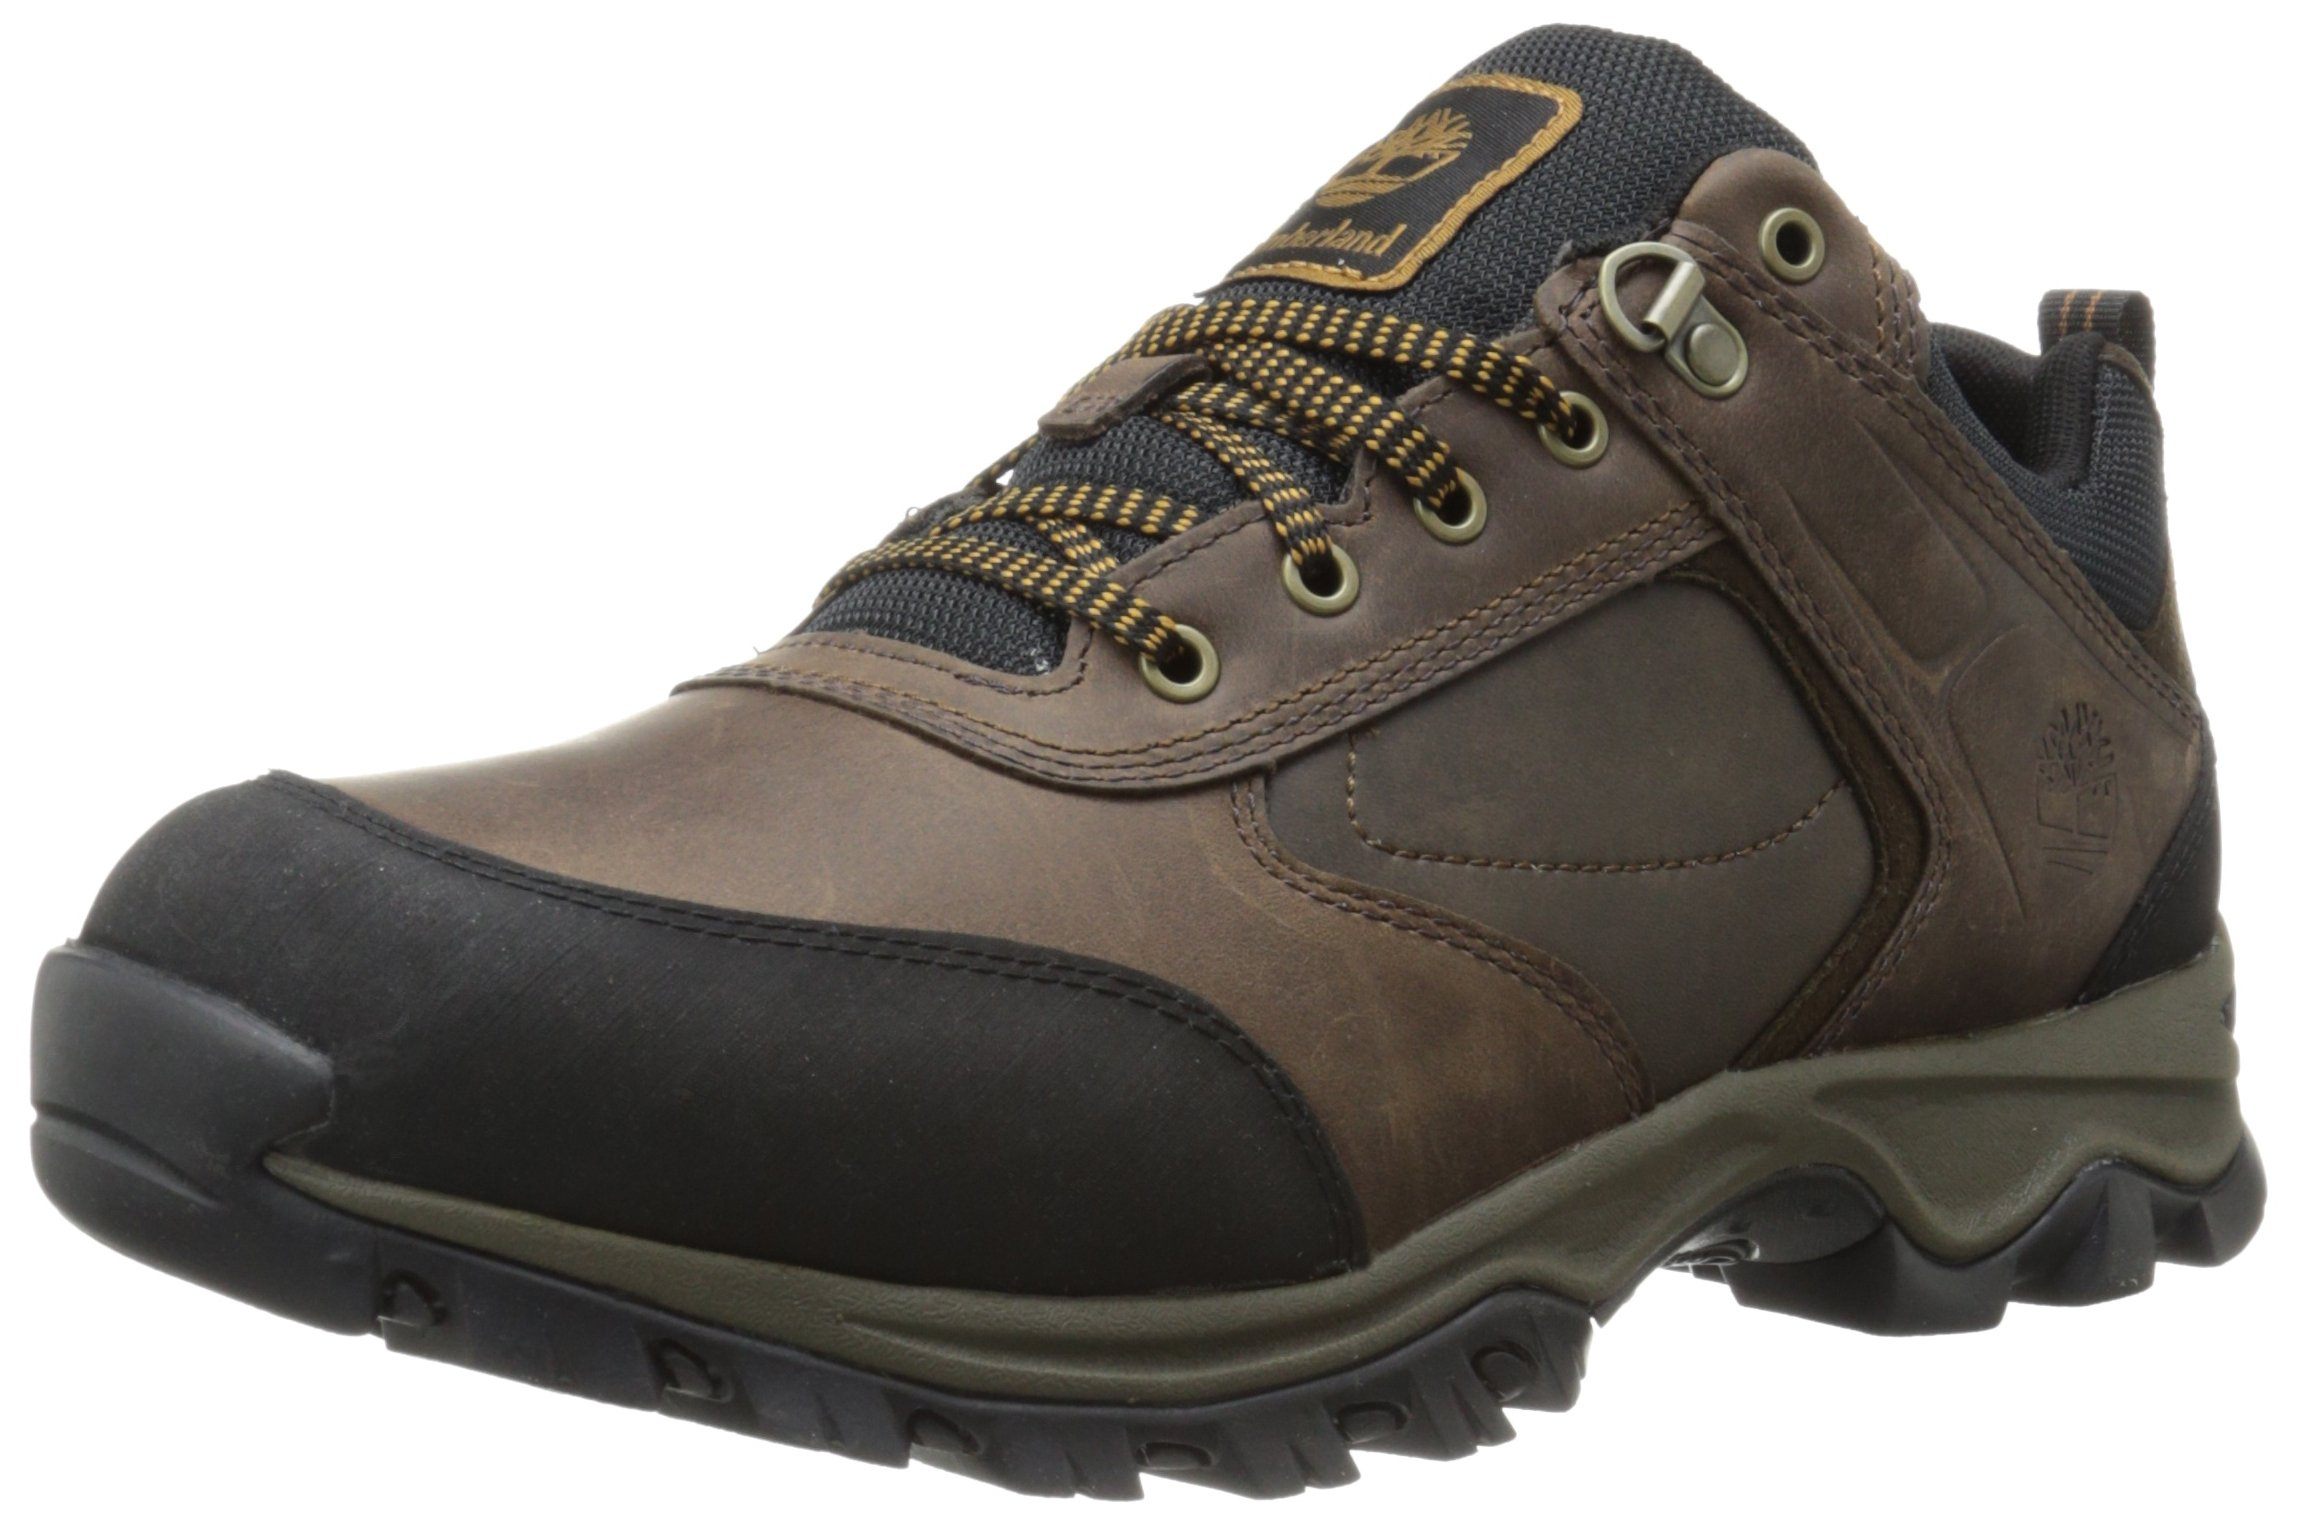 Timberland Men's MT Maddsen Low Boot, Brown, 13 M US